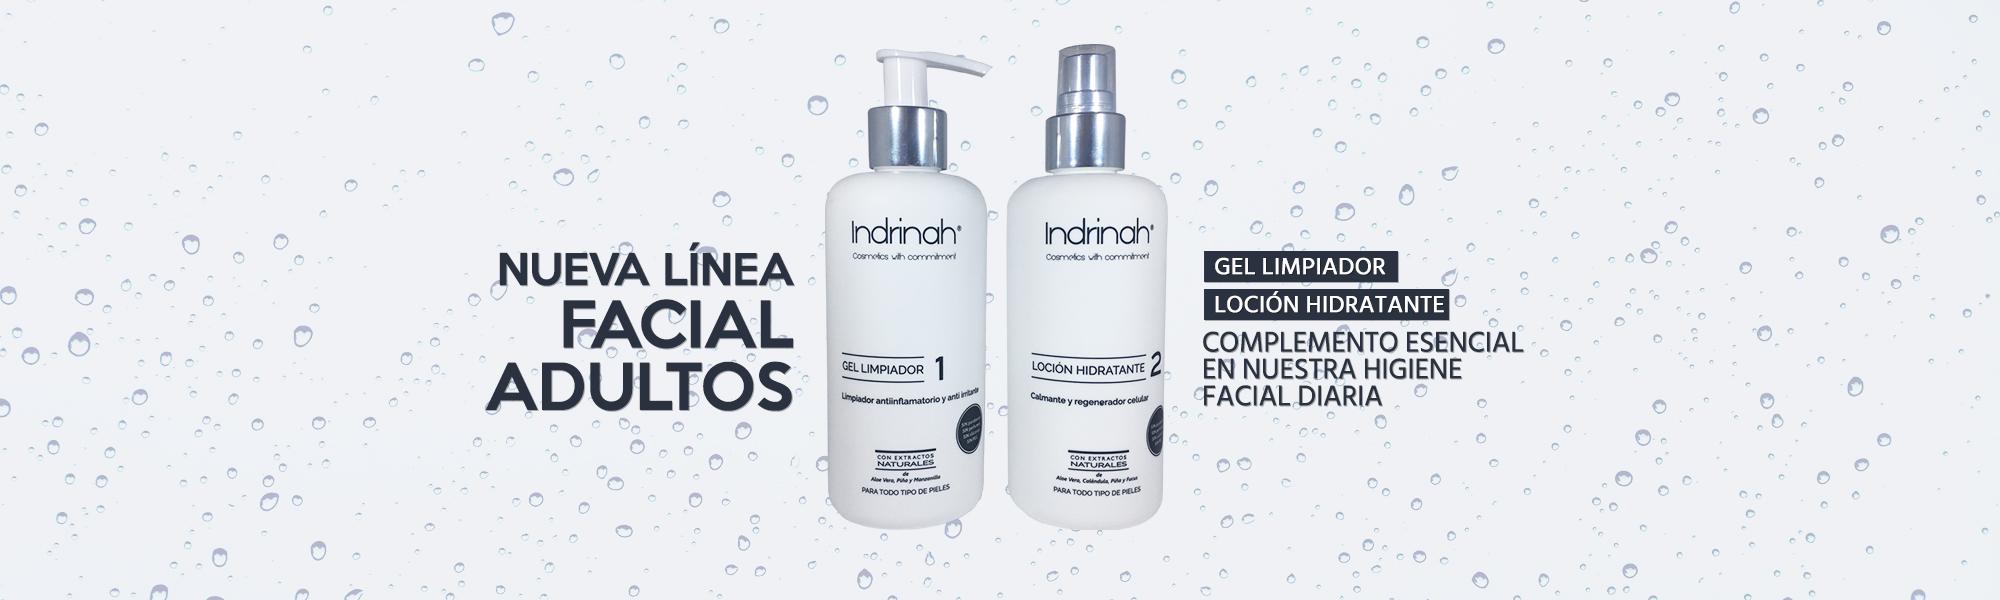 Pack higiene facial de Indrinah